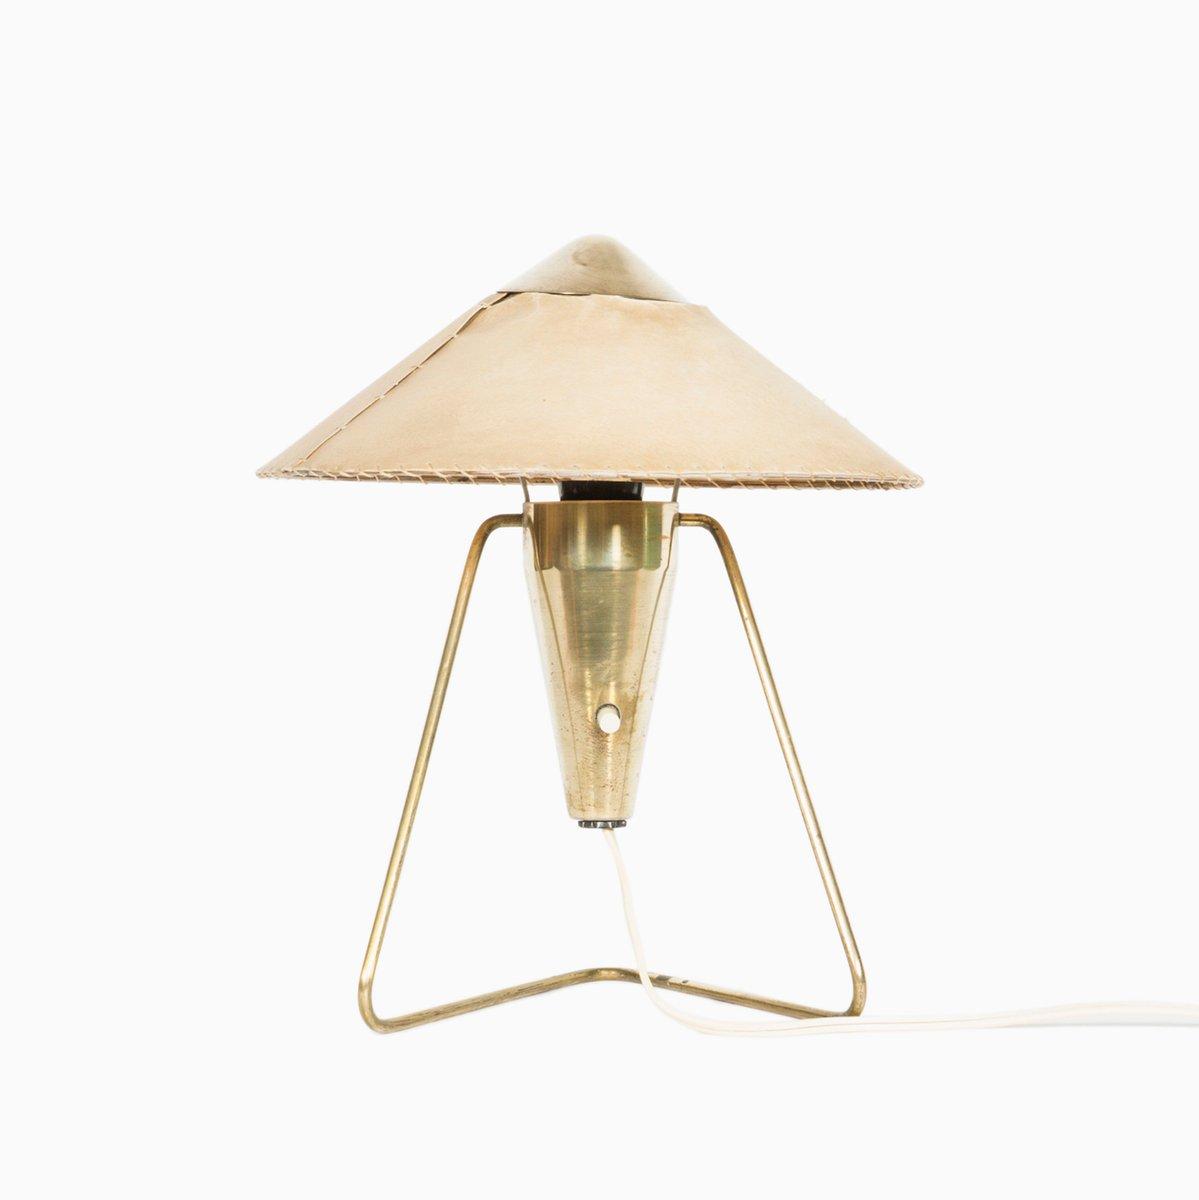 messing lampe 1960er bei pamono kaufen. Black Bedroom Furniture Sets. Home Design Ideas